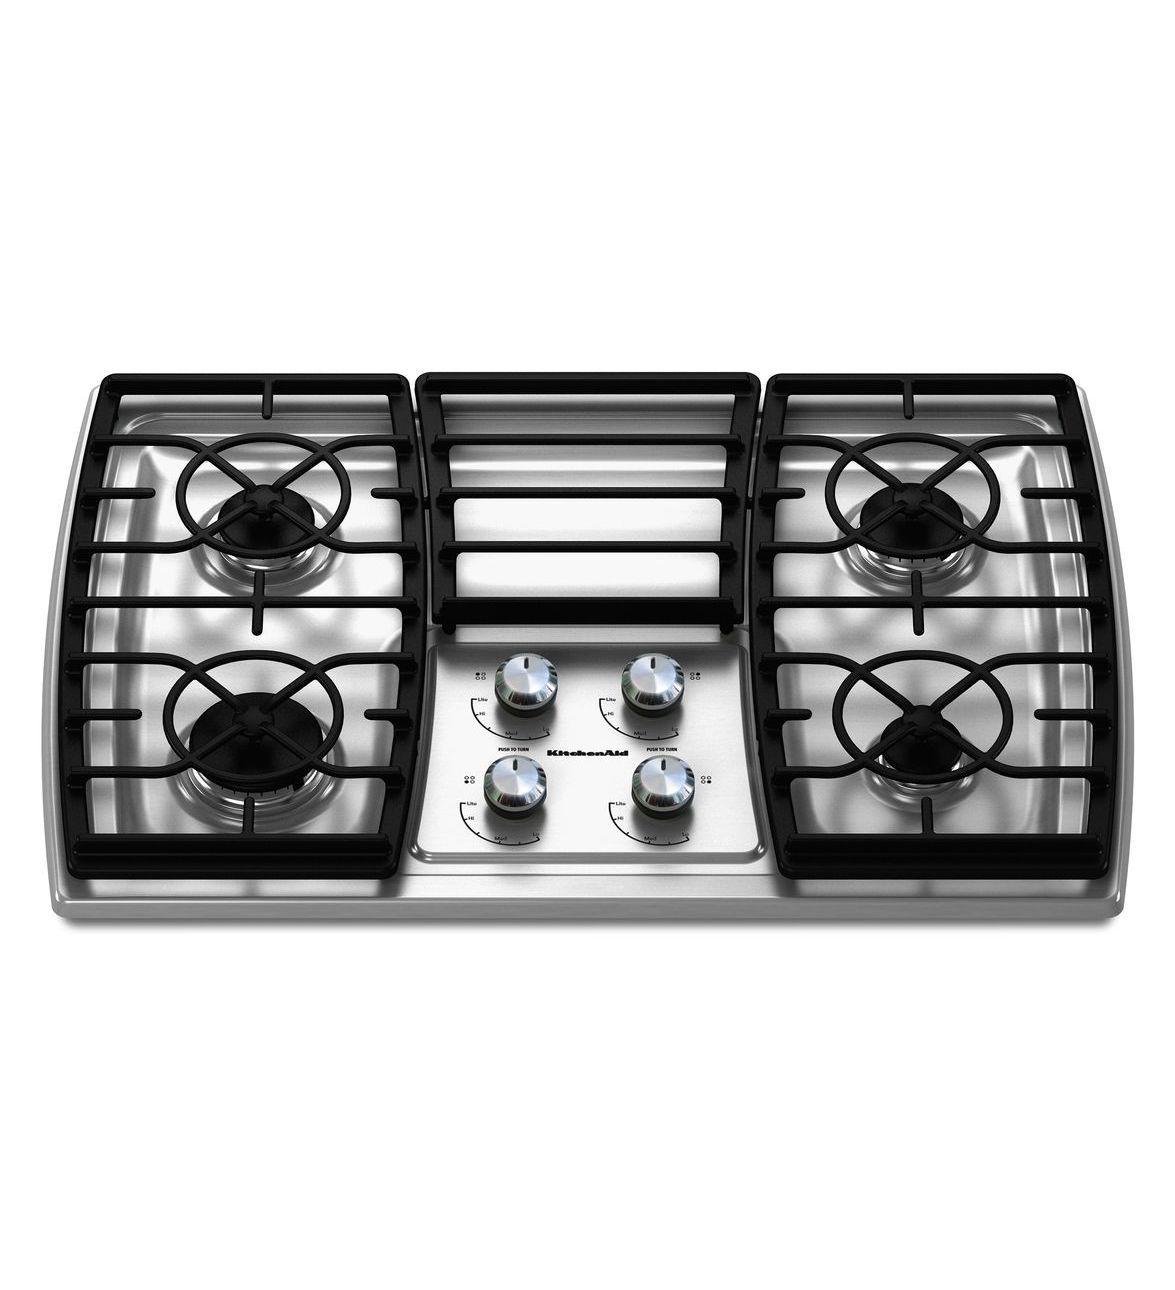 Kitchenaid 30 Inch 4 Burner Gas Cooktop Architect Series Ii Gas Cooktop Cooktop Kitchen Aid